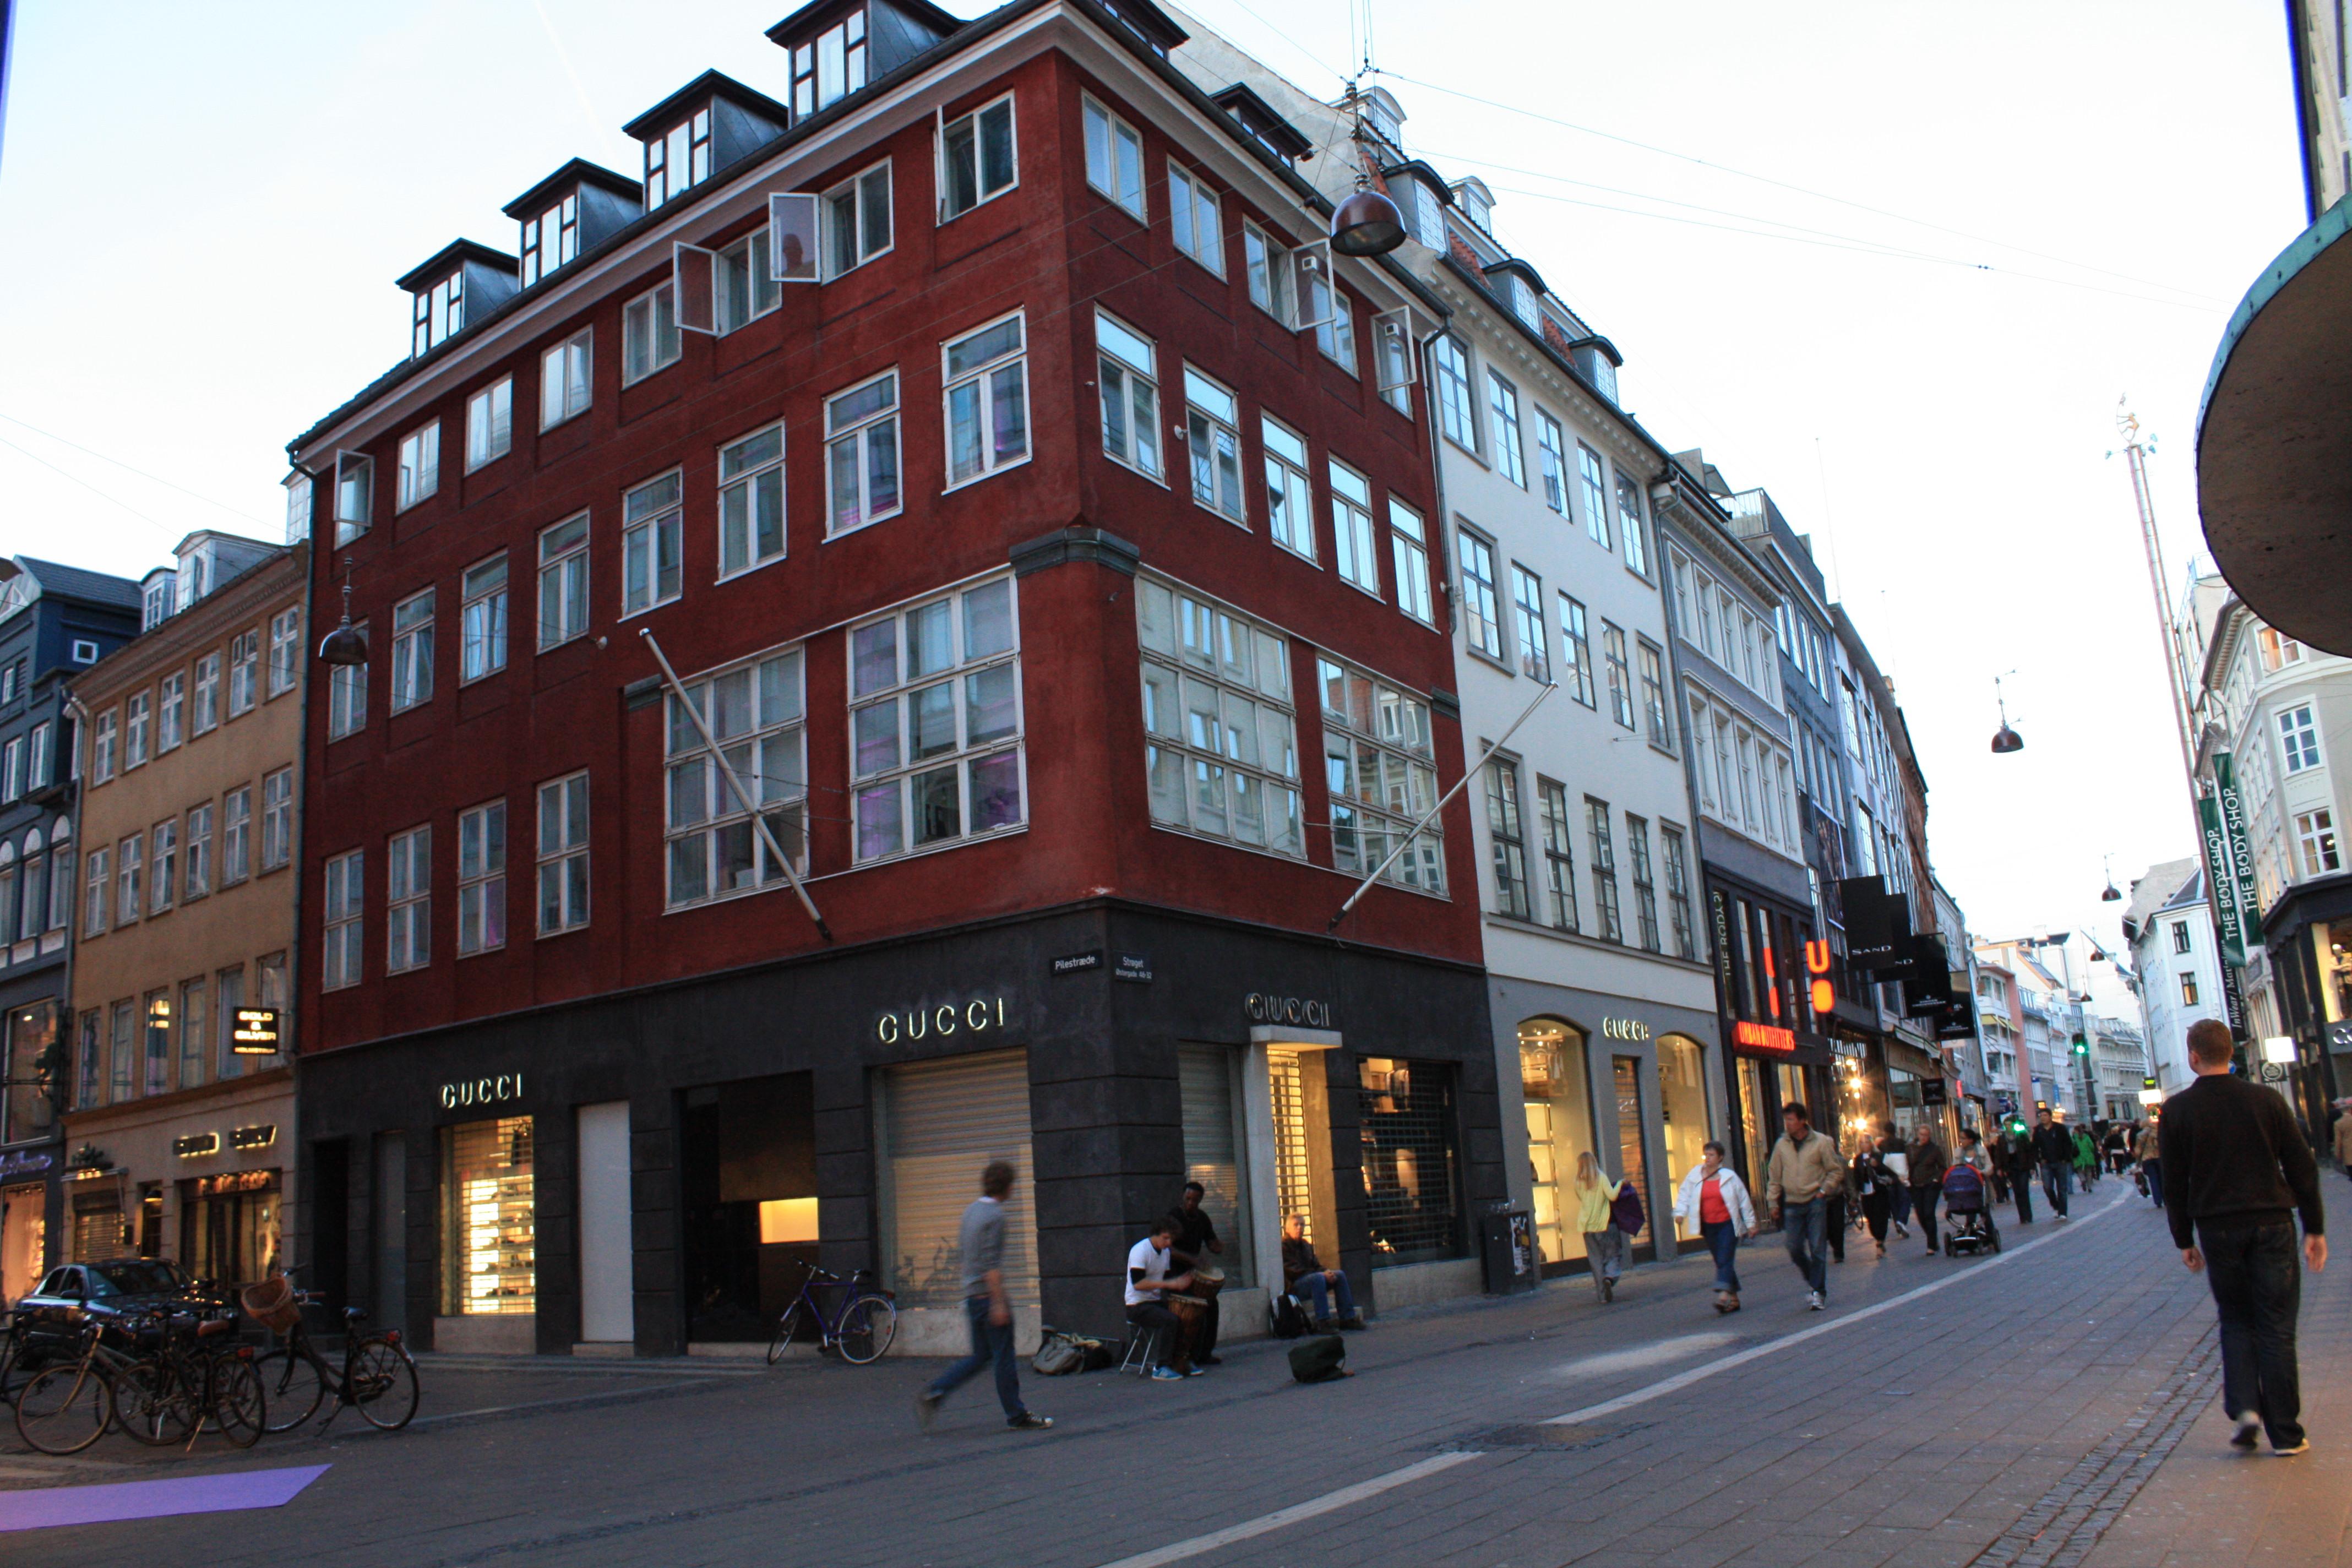 Gucci global luxury goods essay analysis gucci global prov